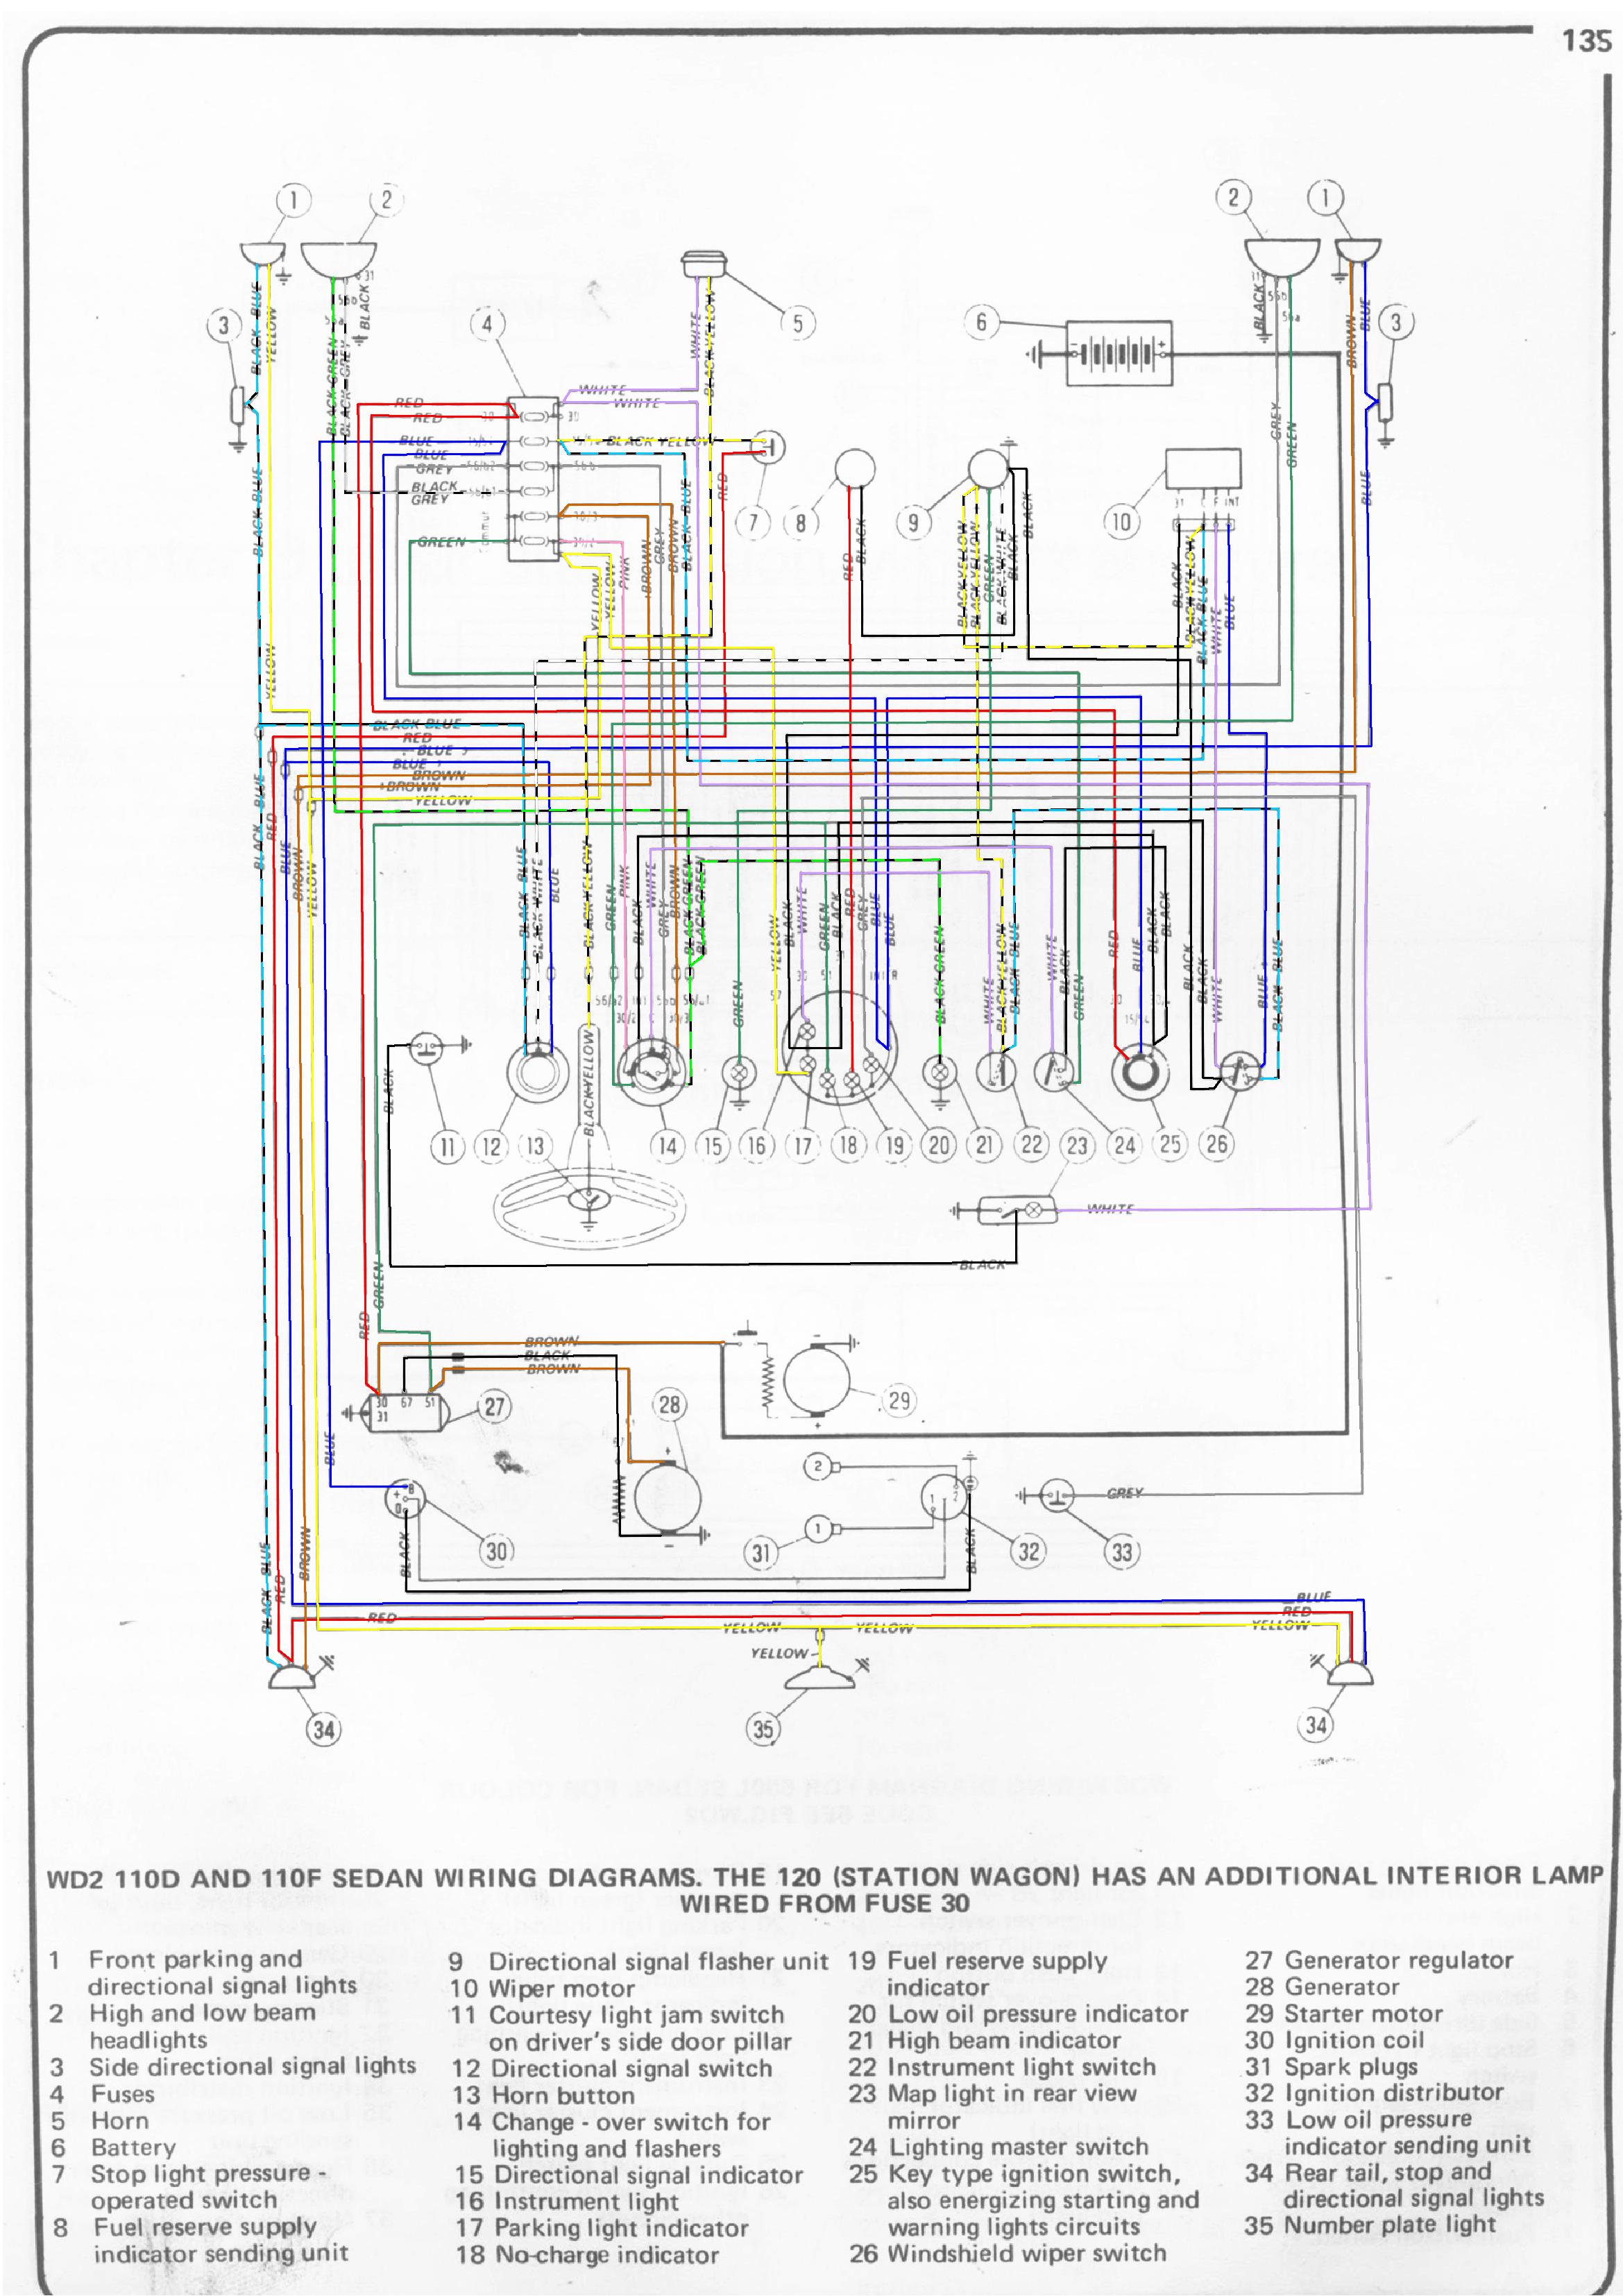 fiat 500 d wiring diagram 6 dhp zionsnowboards de \u2022fiat 500 d wiring diagram 1 5 bandidos kastellaun de u2022 rh 1 5 bandidos kastellaun